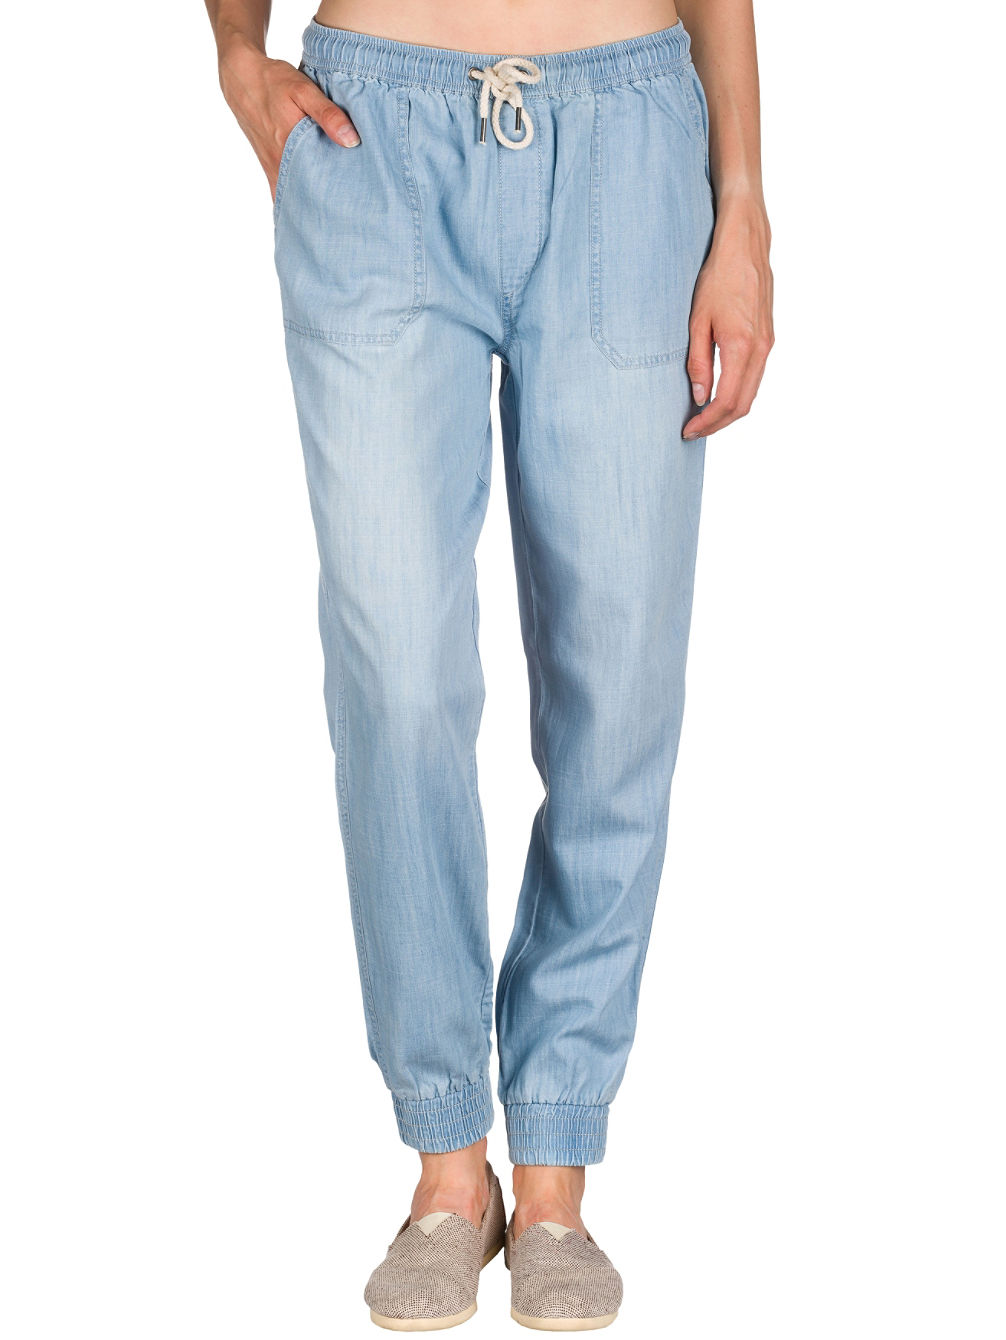 blu-bells-jeans